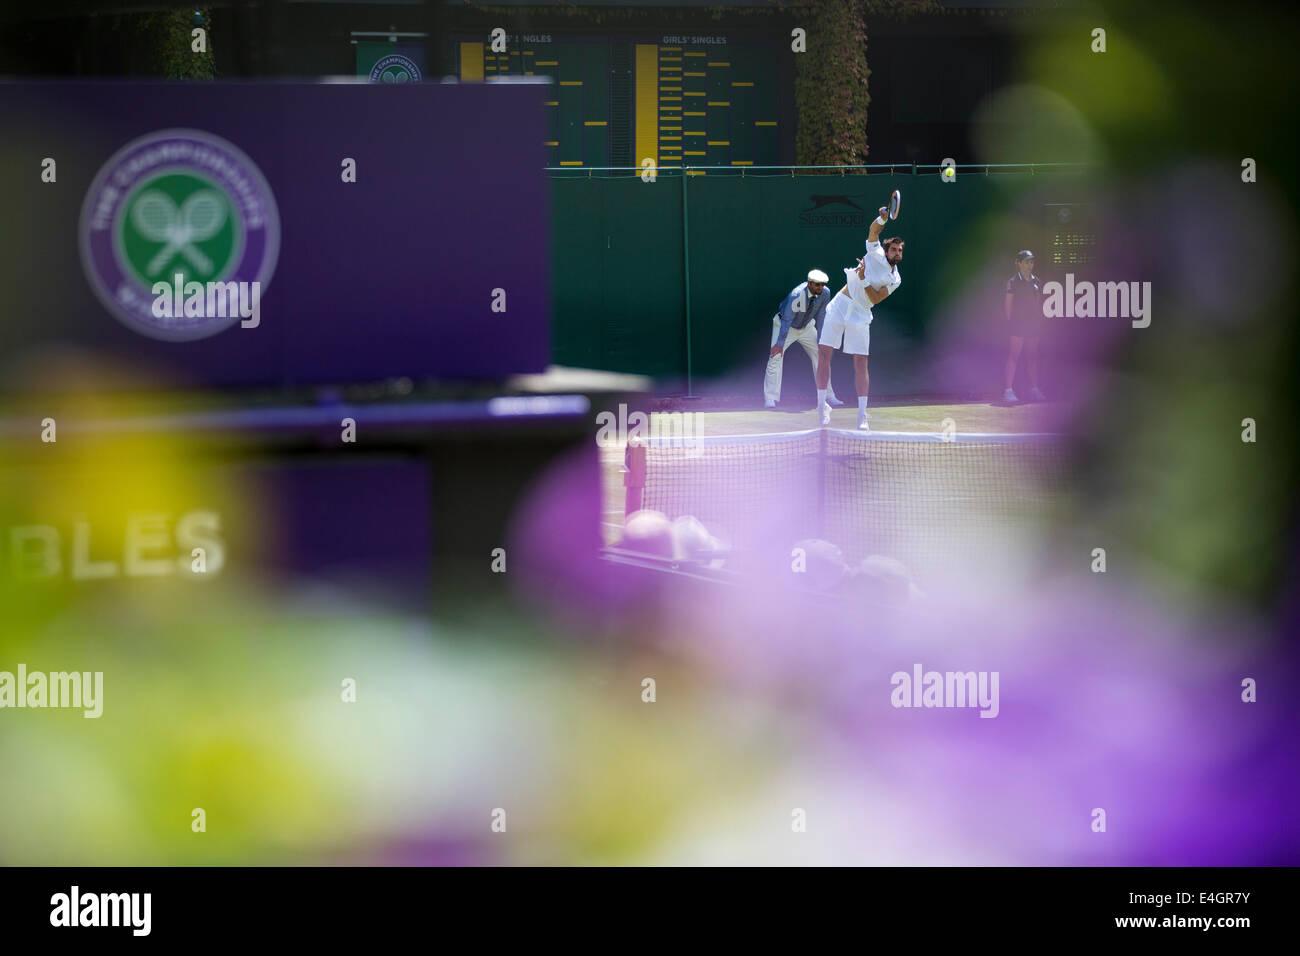 Wimbledon Tennis i campionati di Wimbledon 2014 All England Lawn Tennis & Crocquet Club Wimbledon Day 3 Mercoledì Immagini Stock